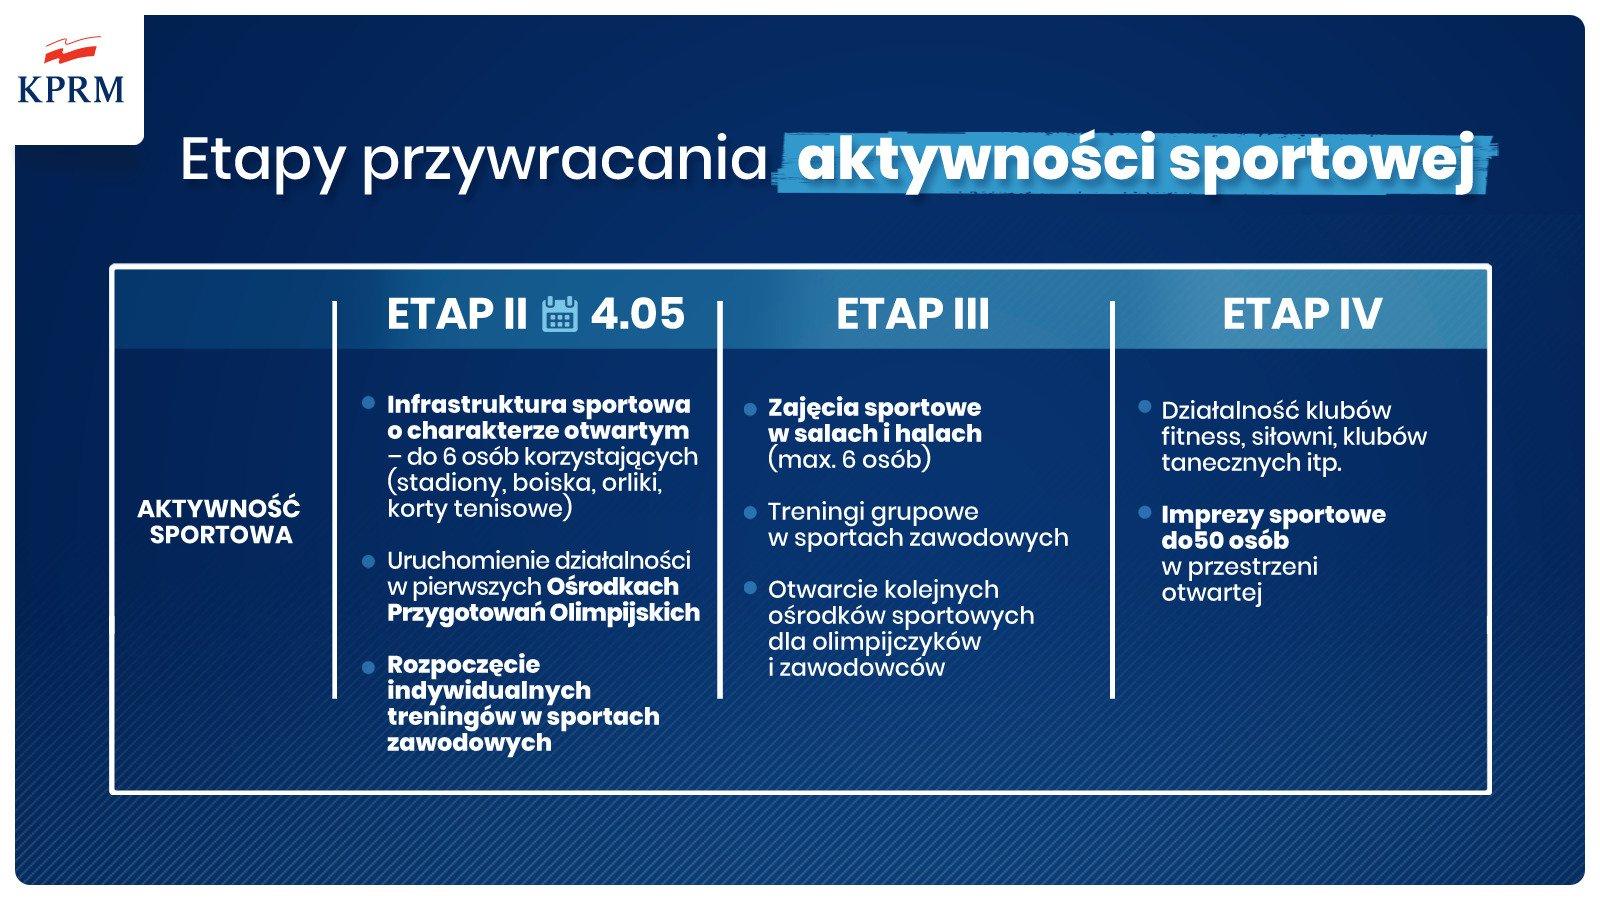 Twiter Kprm Sport Etapy